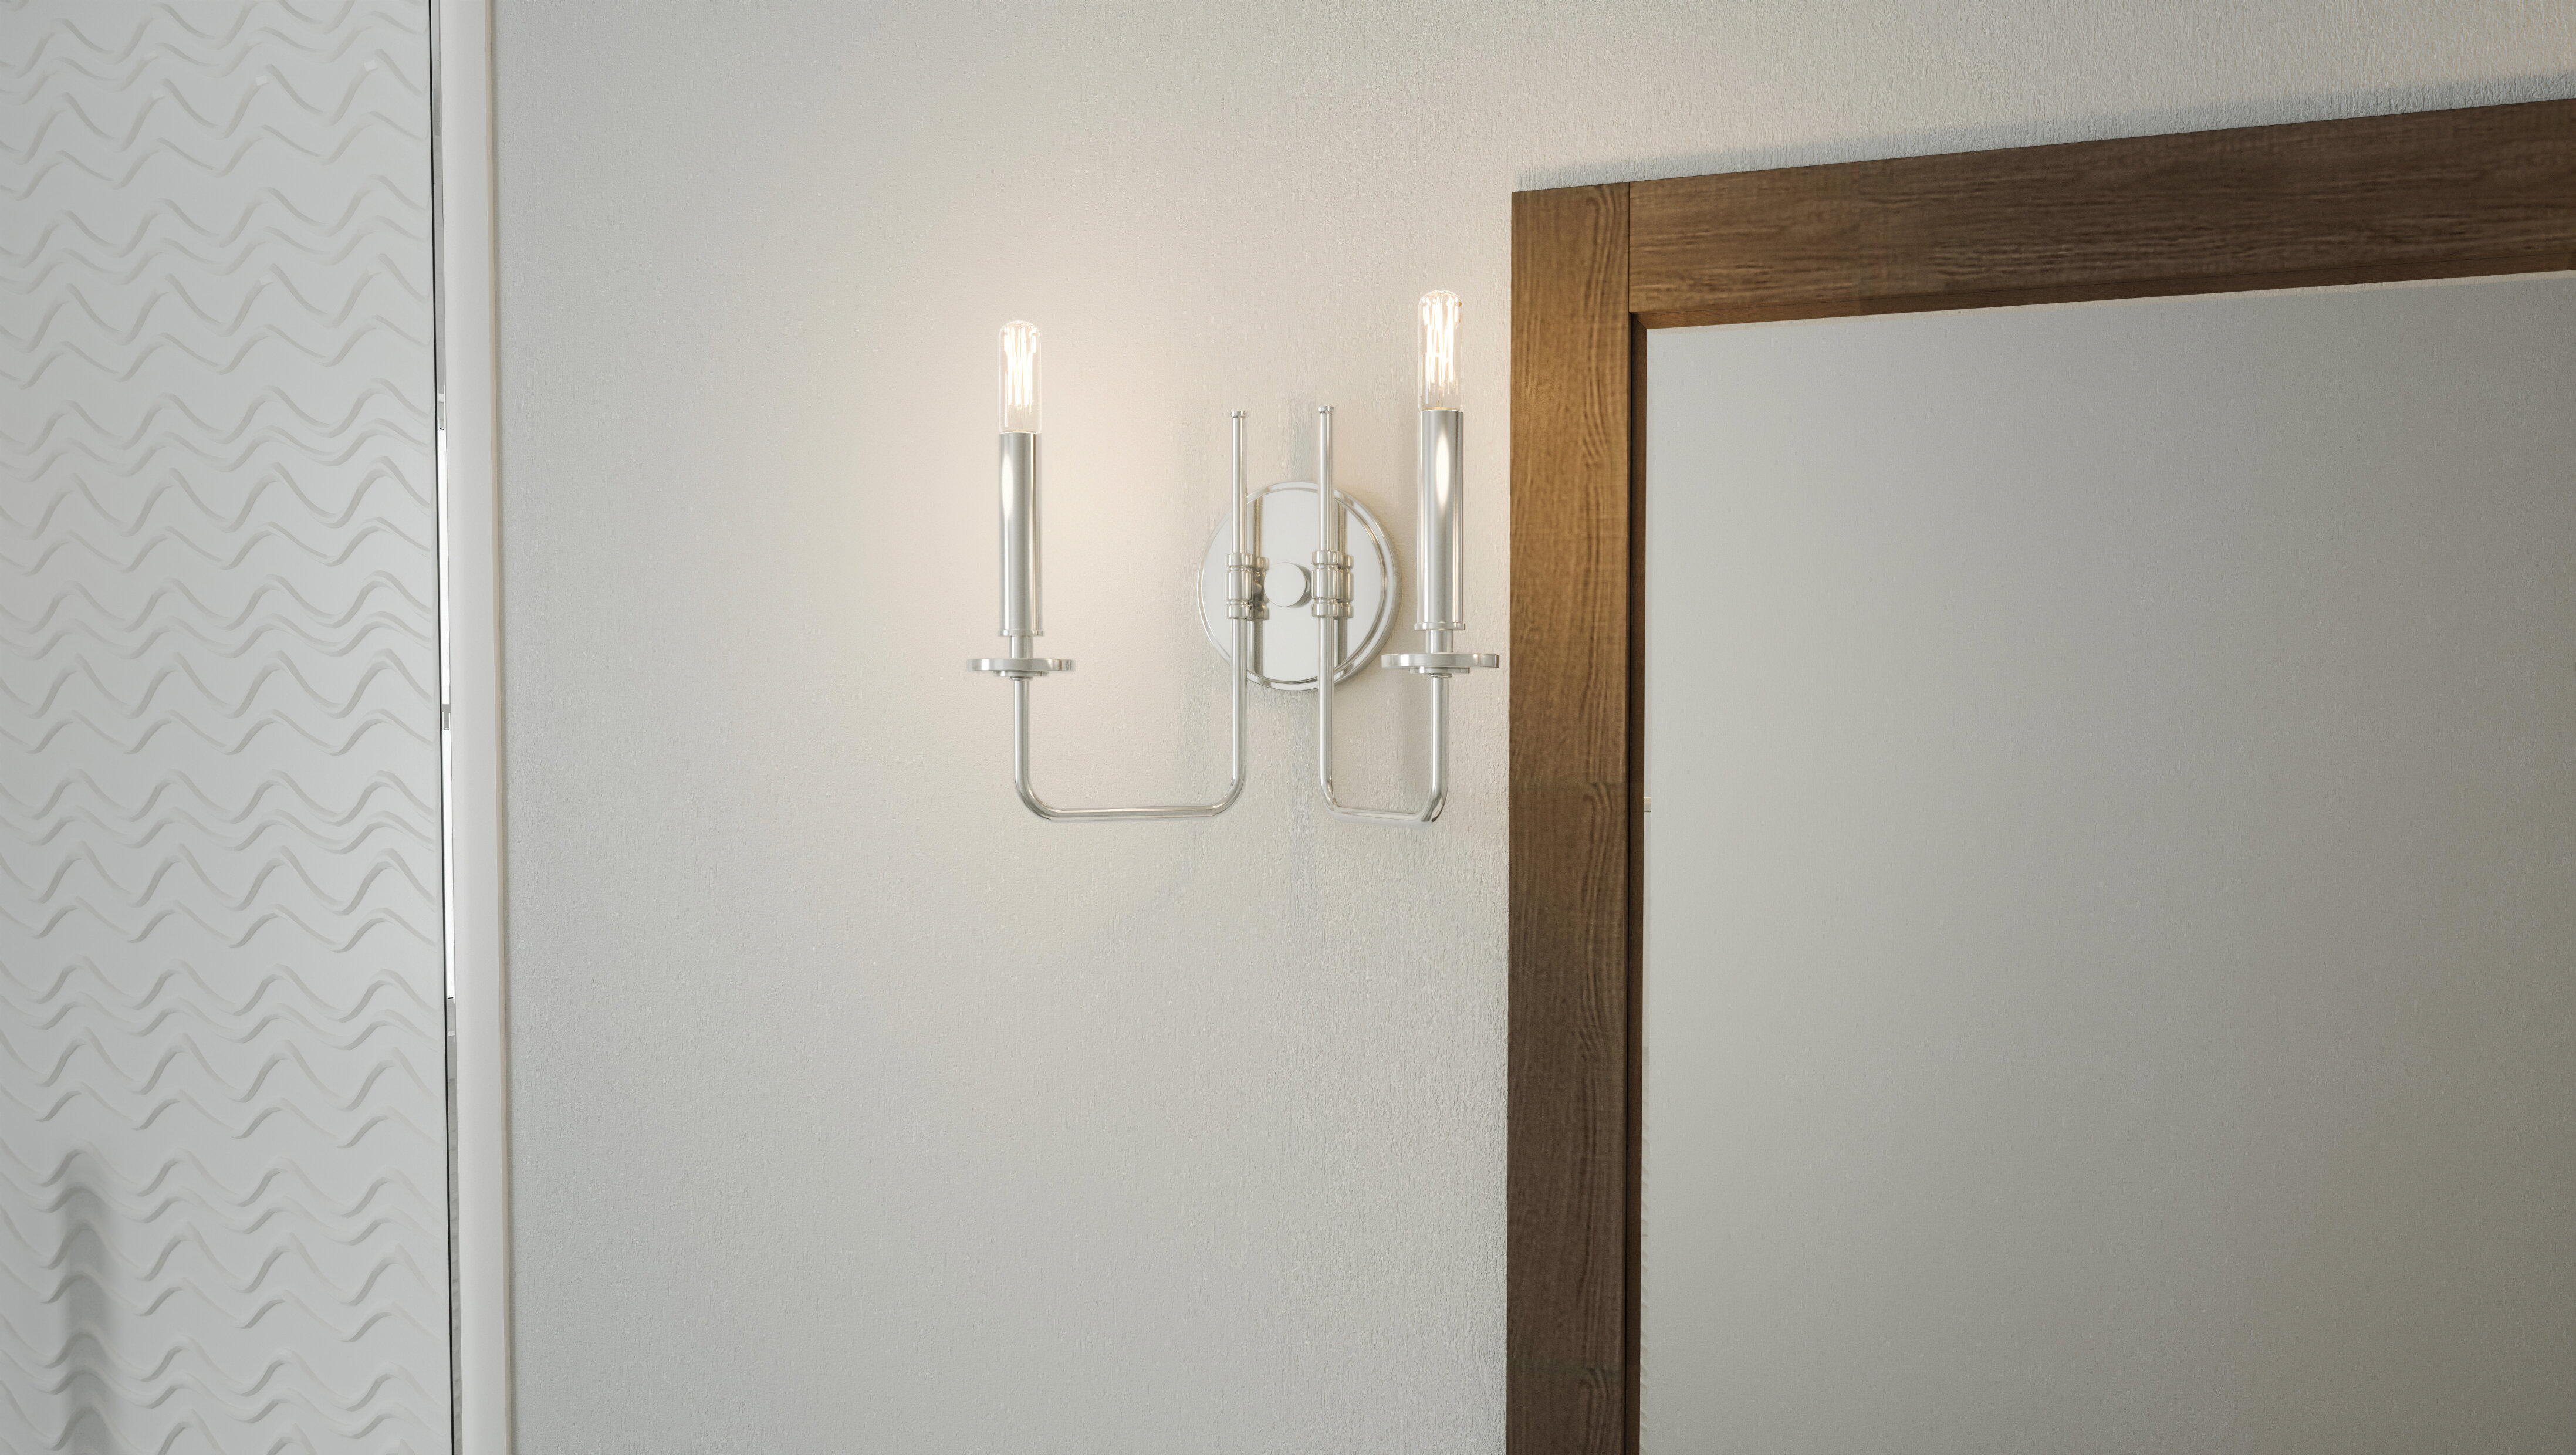 2 Light Mid Century Modern Bathroom Vanity Lighting You Ll Love In 2021 Wayfair